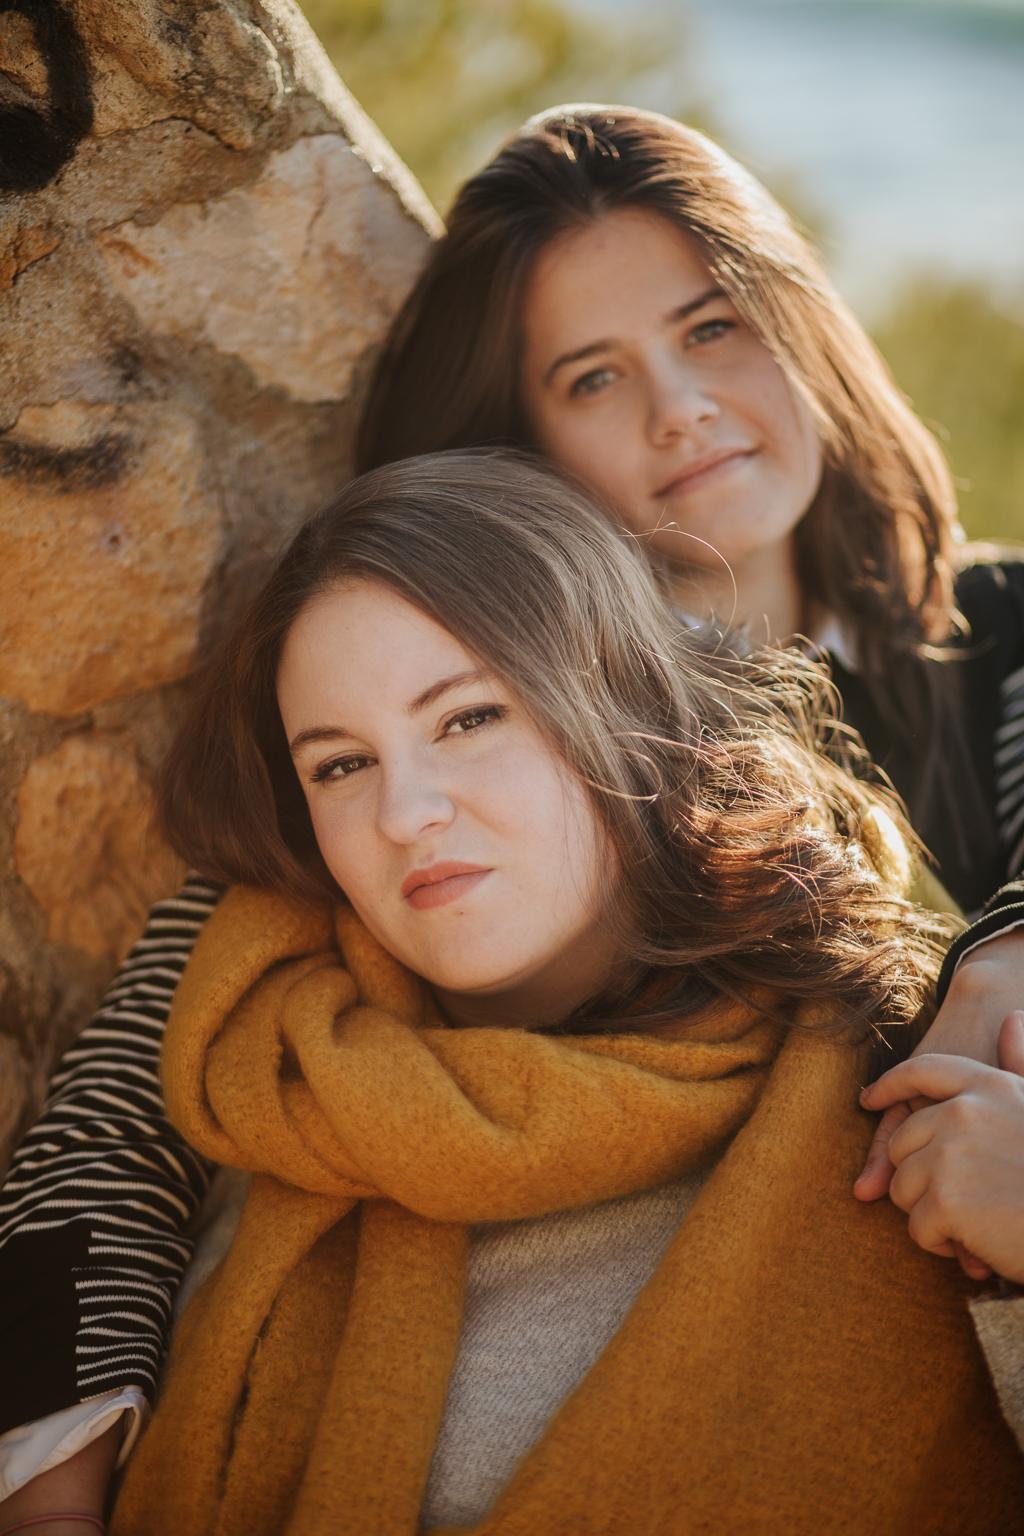 Fotógrafo de pareja Barcelona :: Reportaje fotos en Altafulla :: fotógrafo en Tarragona :: Fotógrafo de bodas gays :: fotógrafo de pareja lesbiana :: Fotógrafo de chicas :: Pareja en Tarragona :: fotógrafo de bodas Barcelona